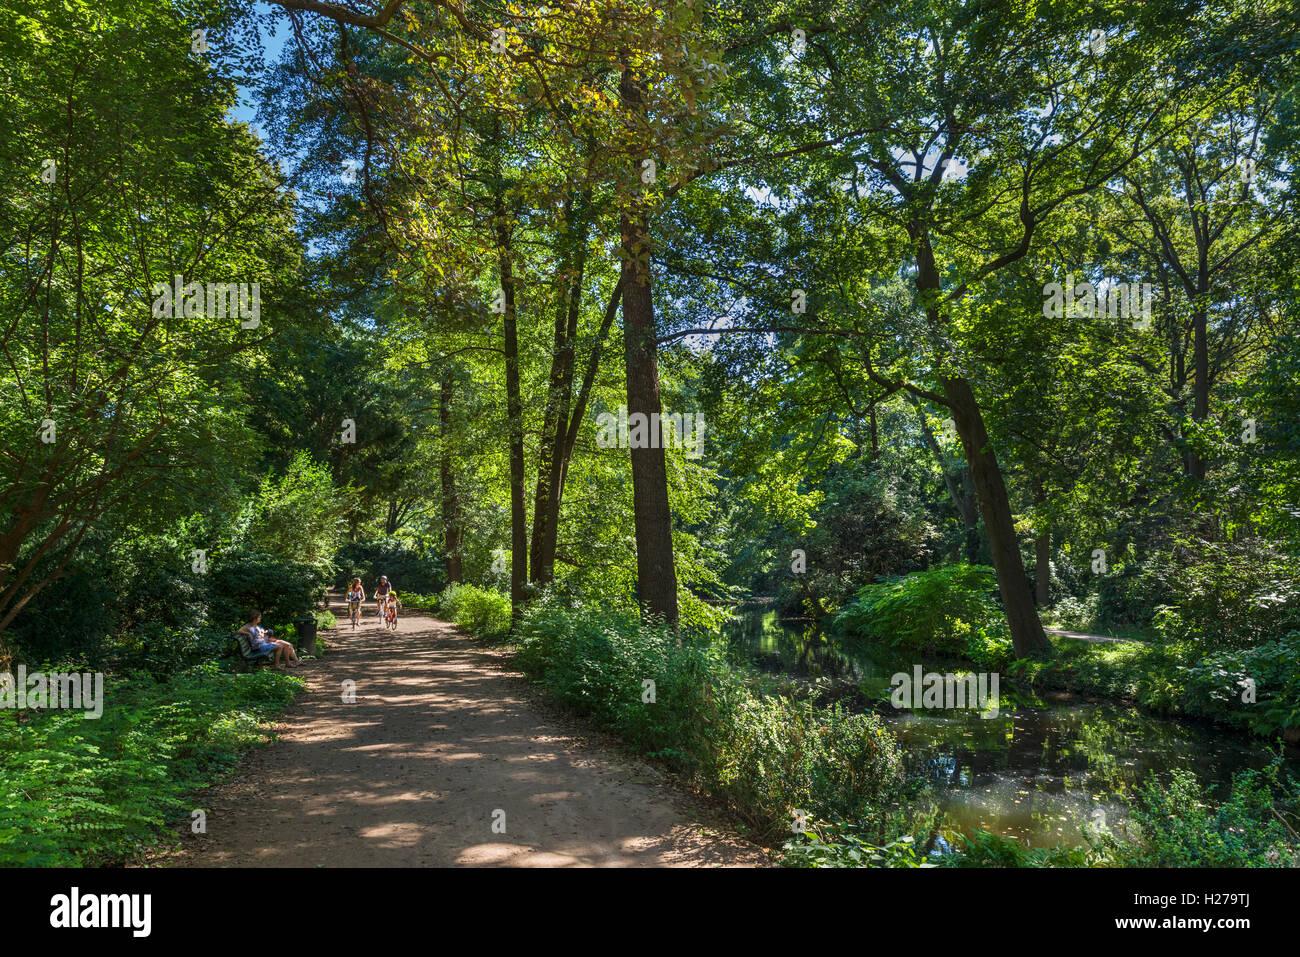 Path through the Tiergarten, Berlin, Germany - Stock Image